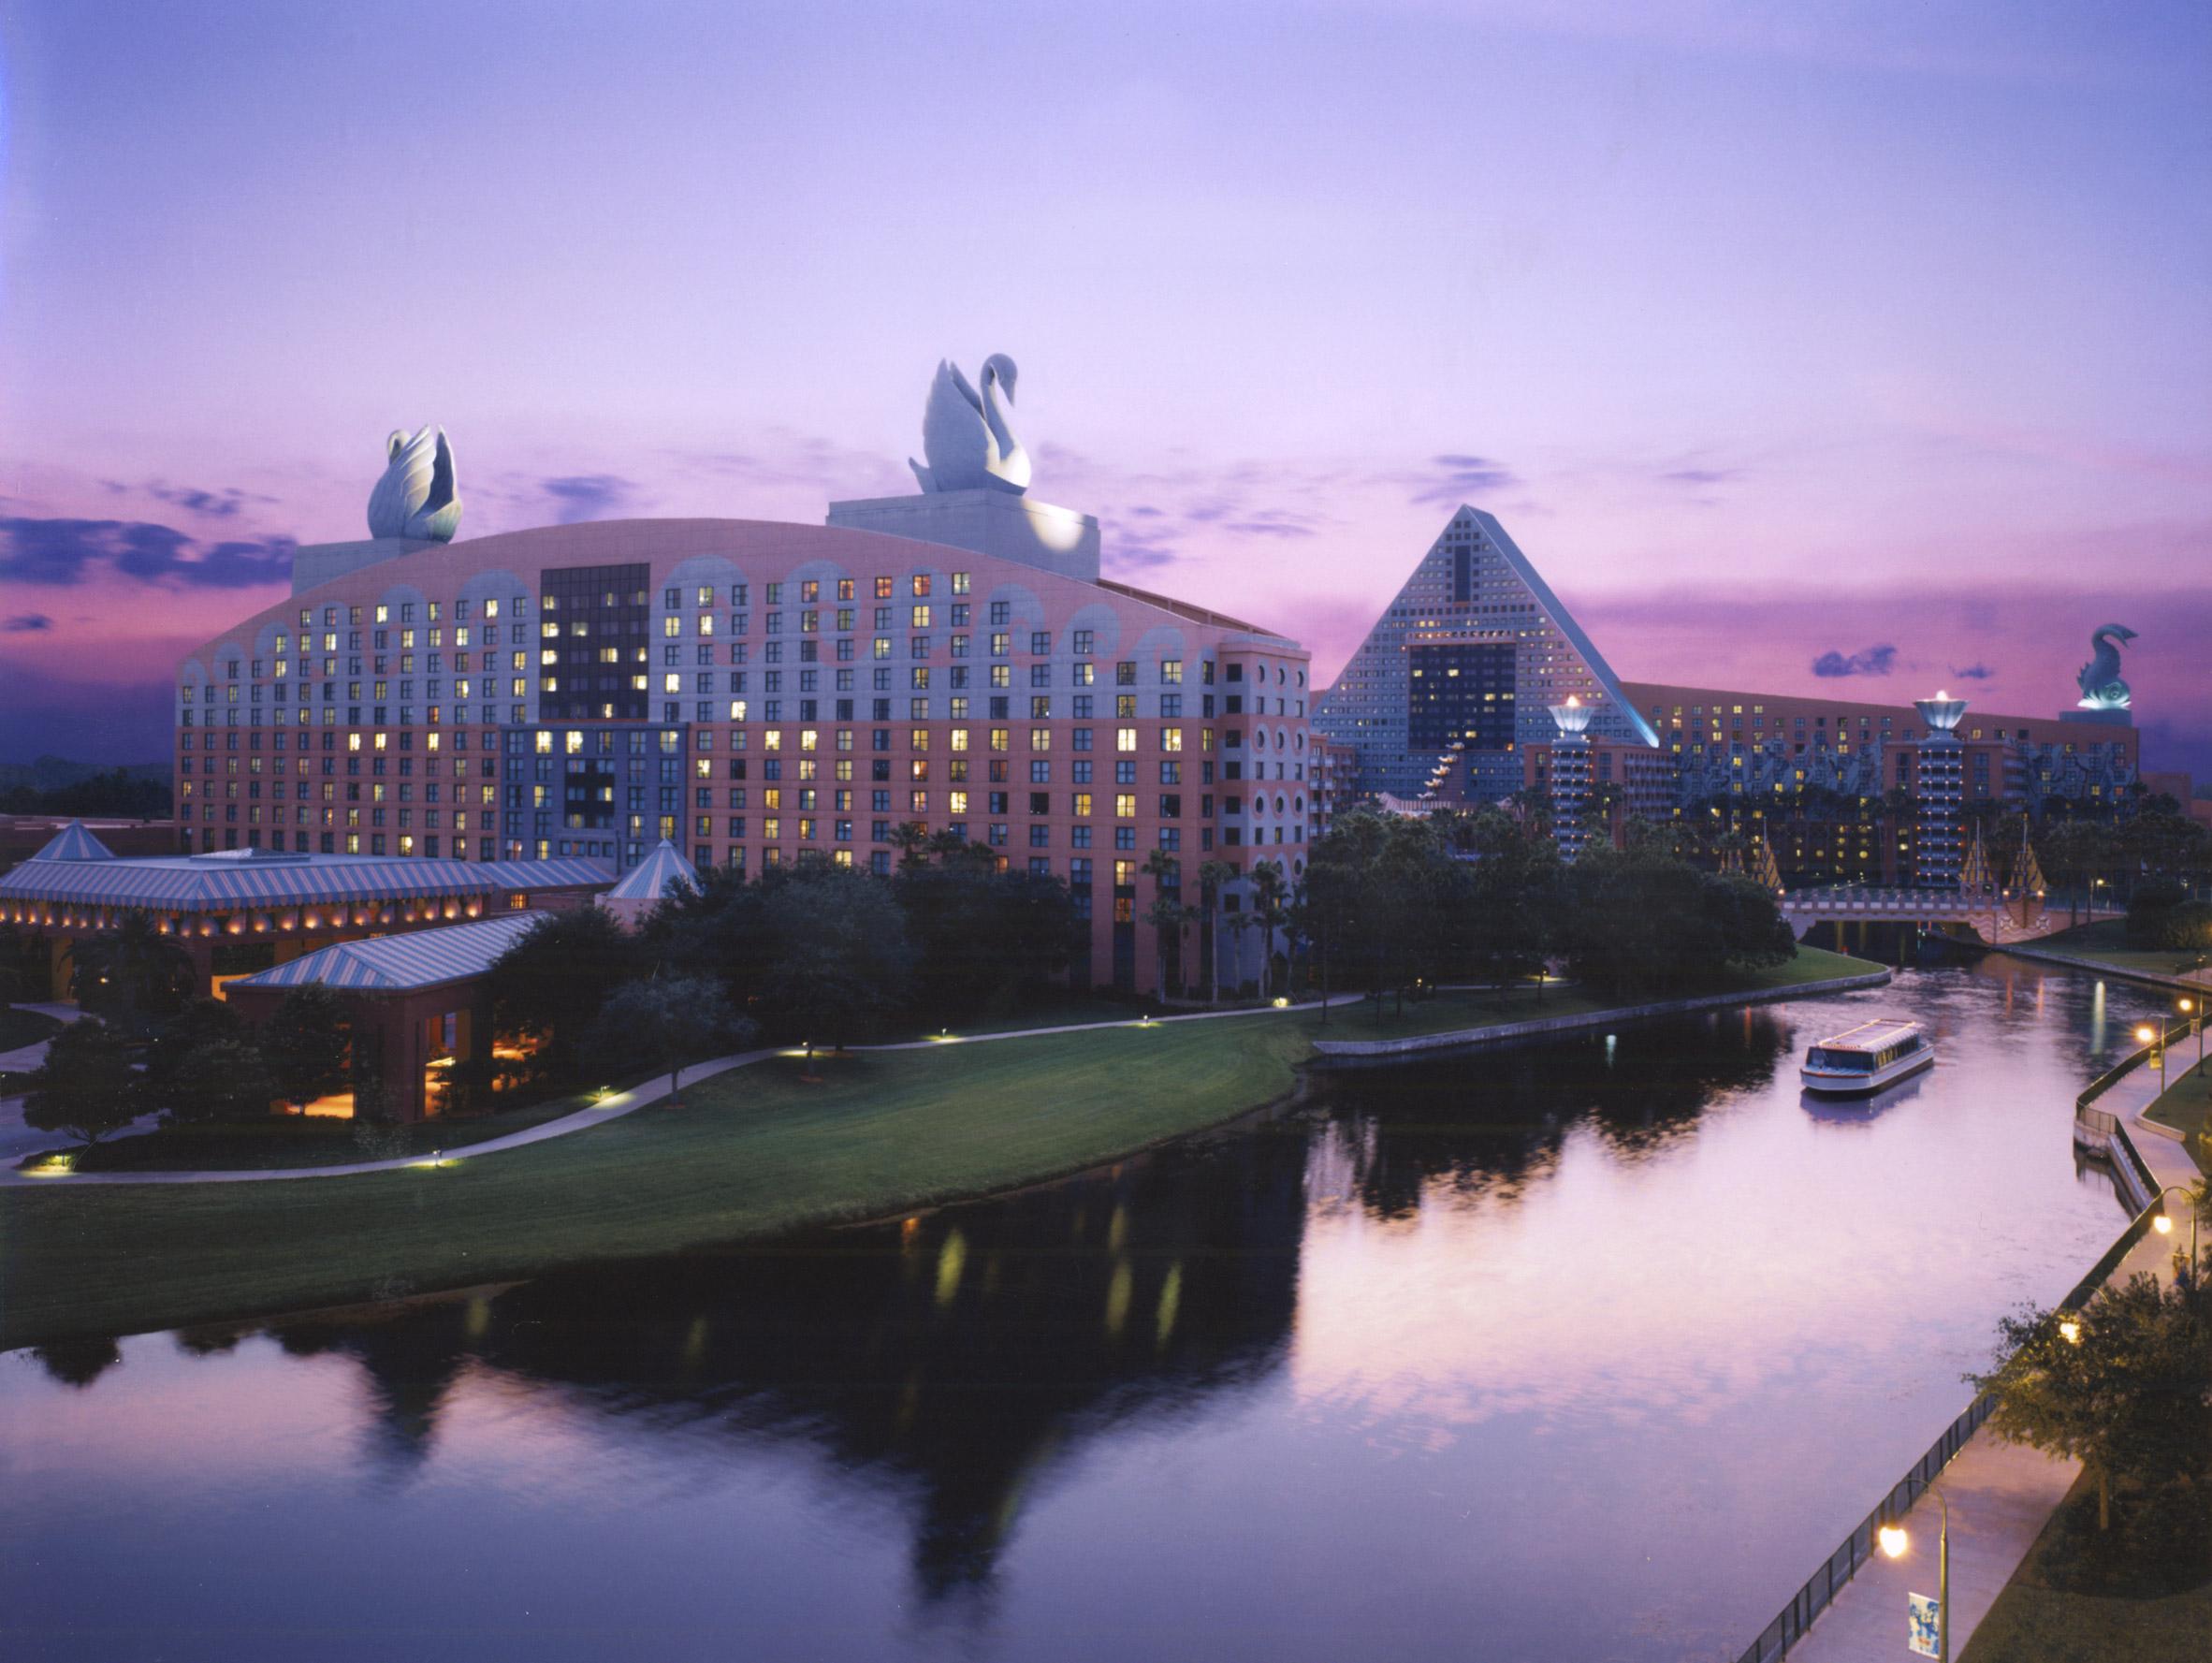 Walt Disney World Swan resort by Michael Graves